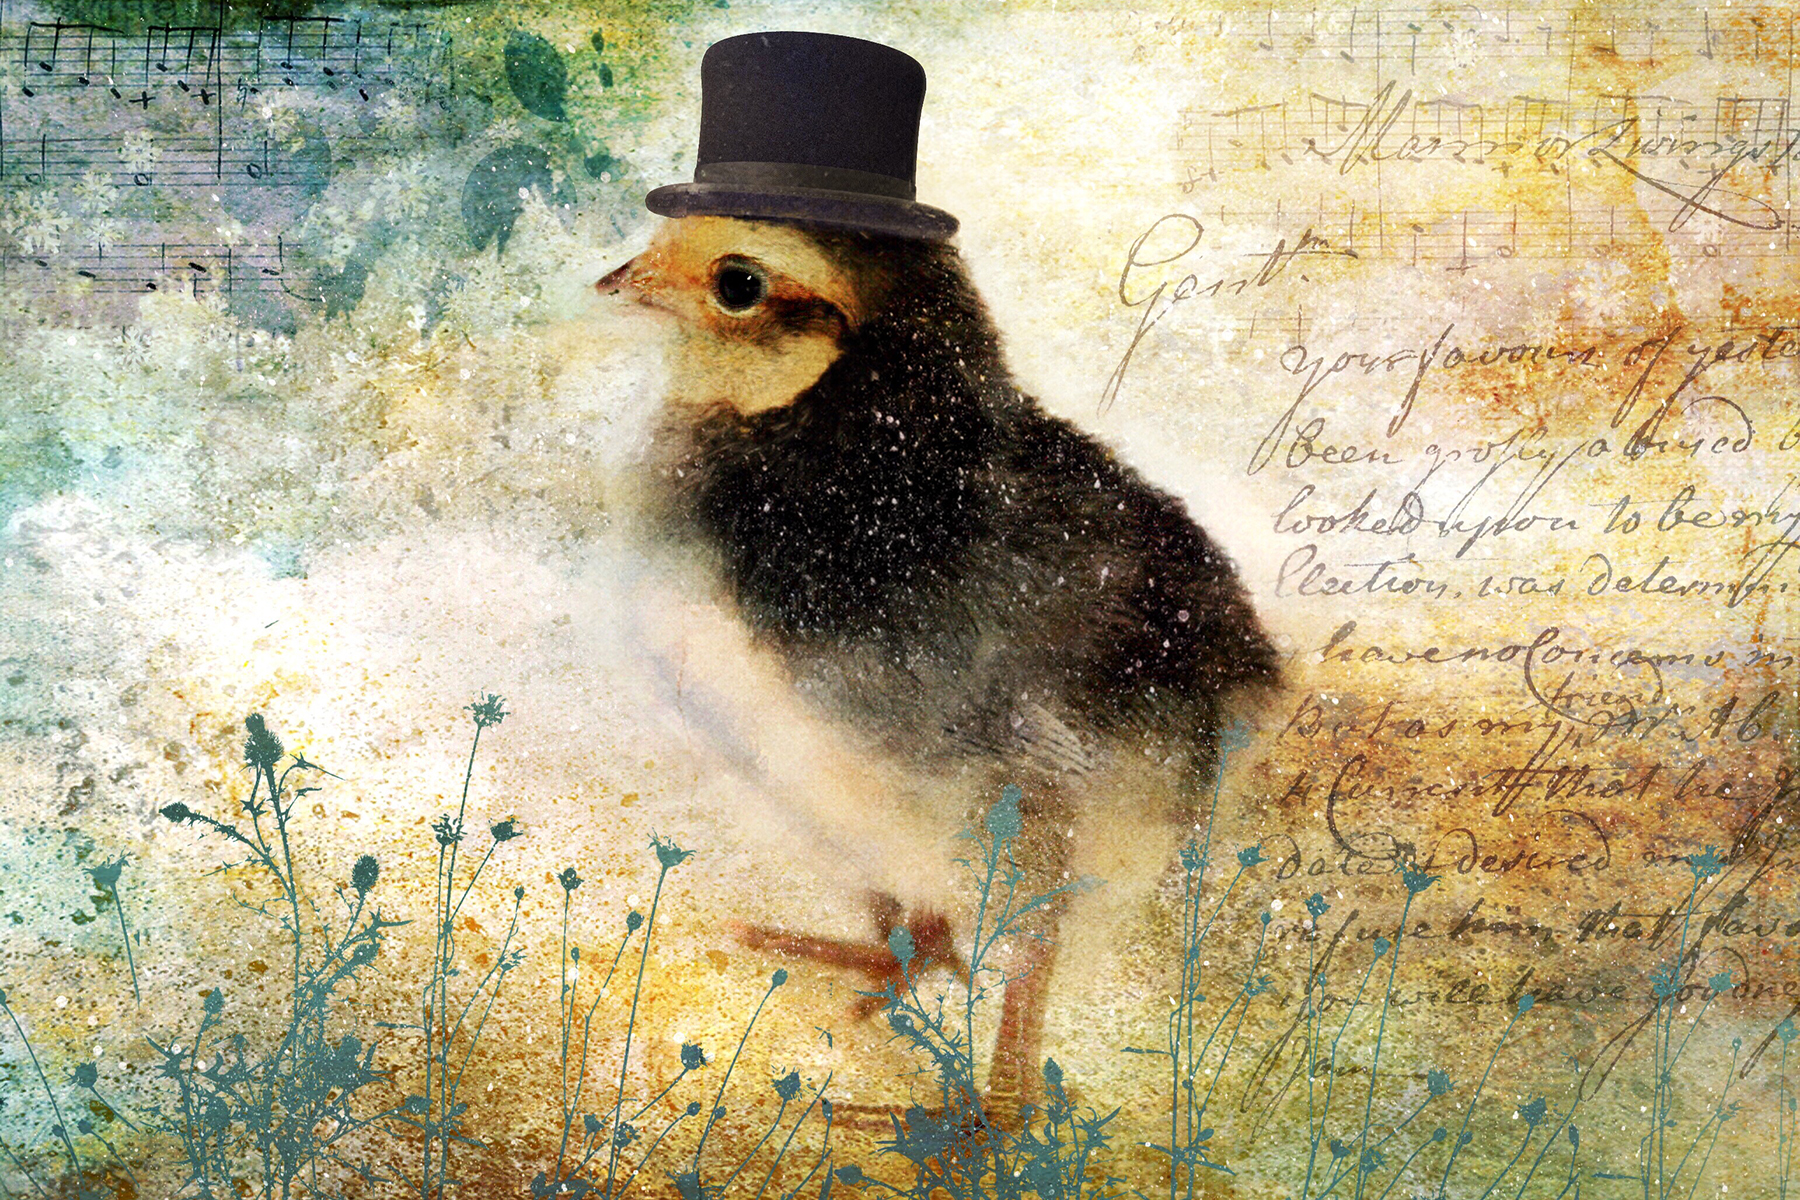 Top Hat Digital Art Collage Postcard To Print, Frame or Send – Free Download